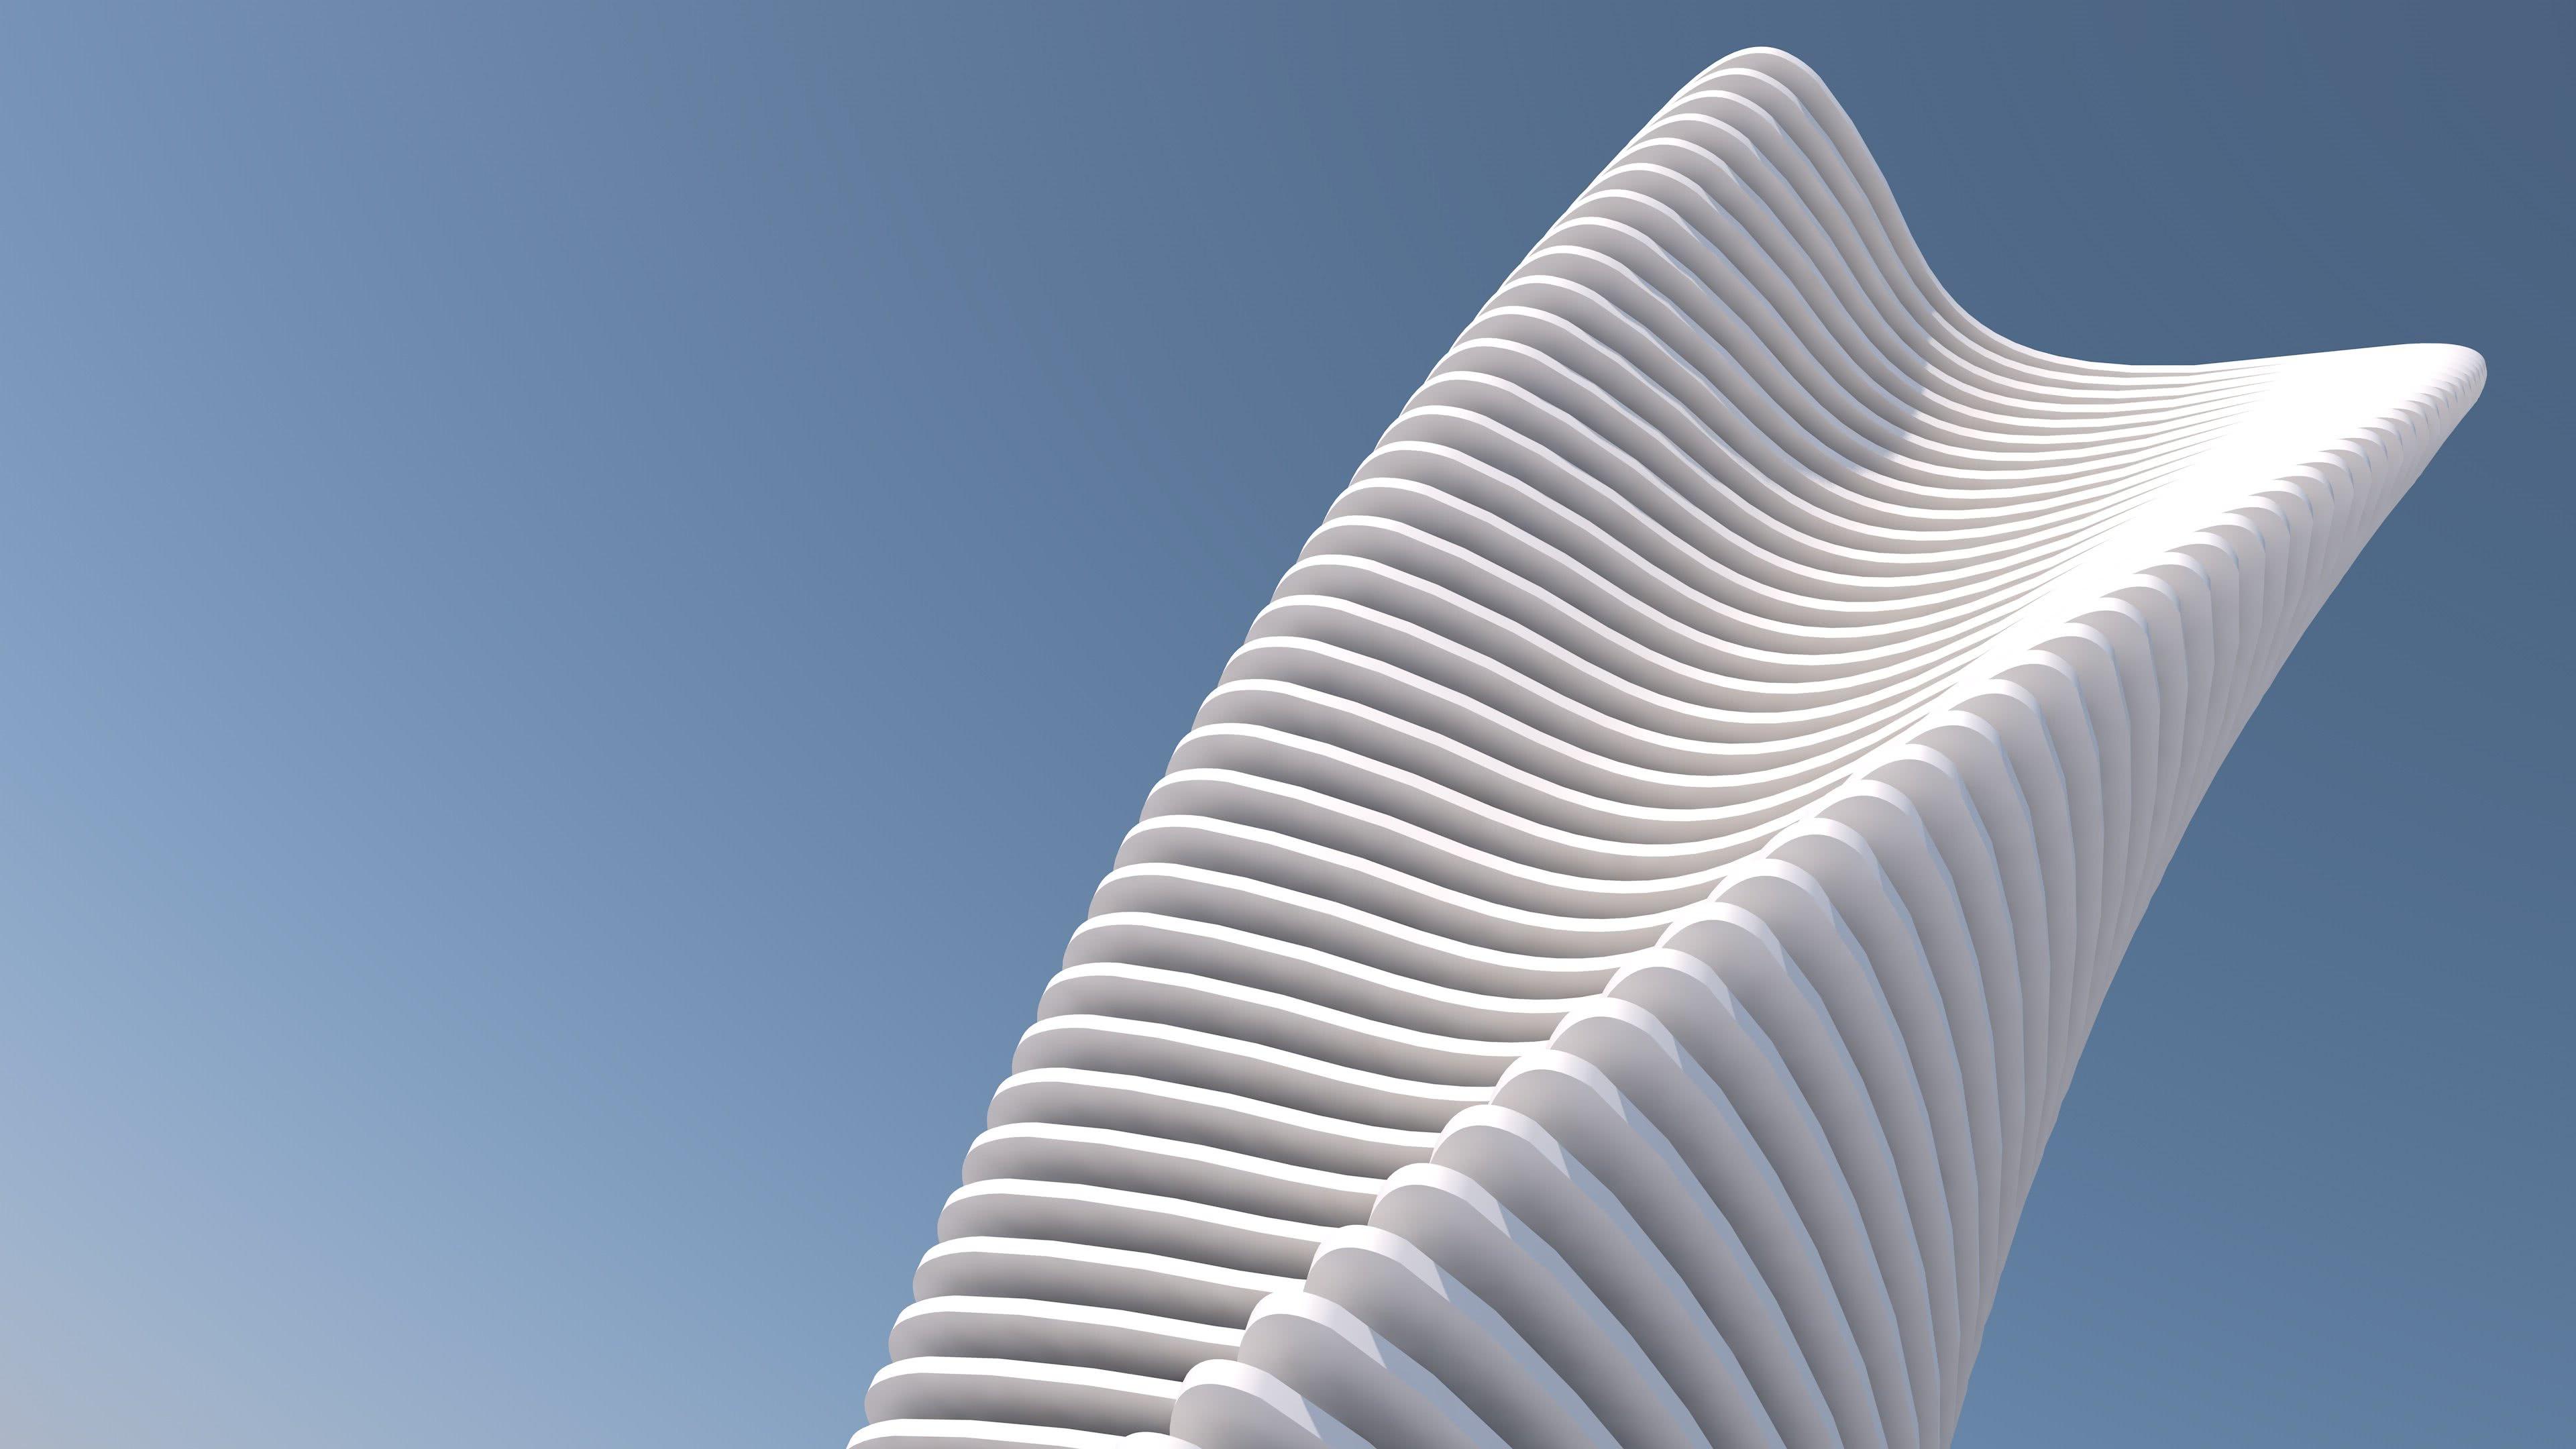 minimalist architecture uhd 4k wallpaper